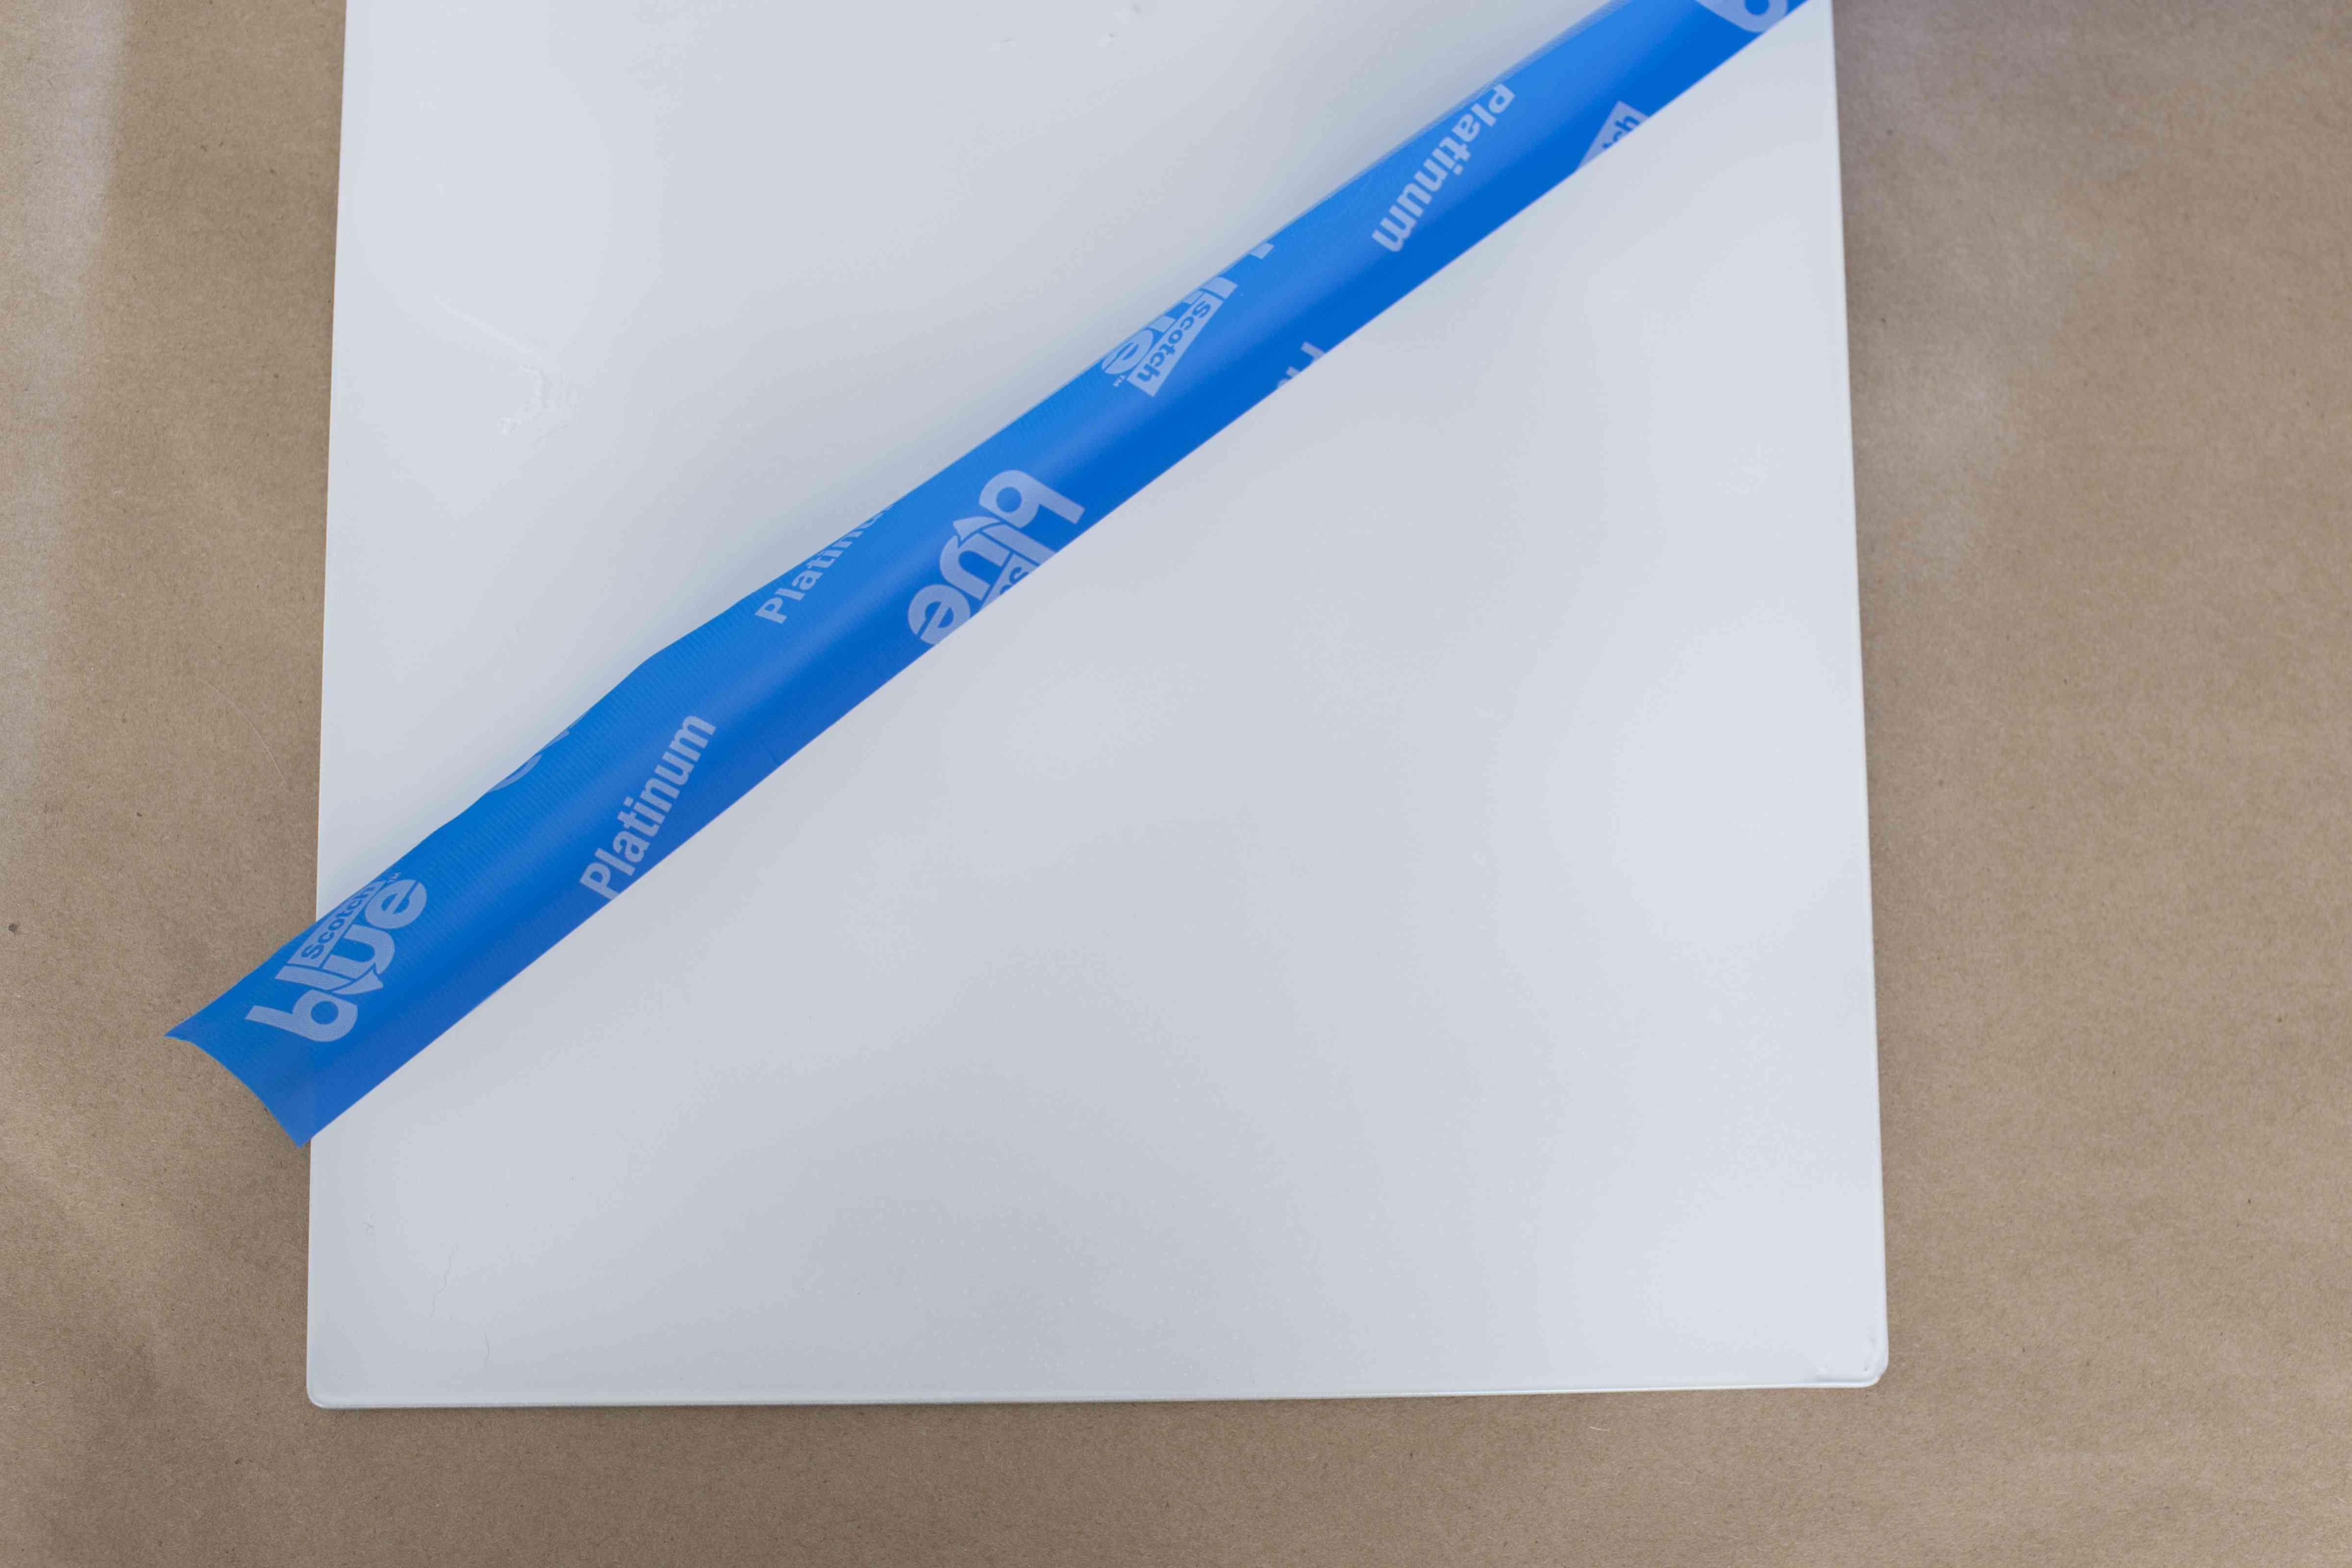 Apply painter's tape